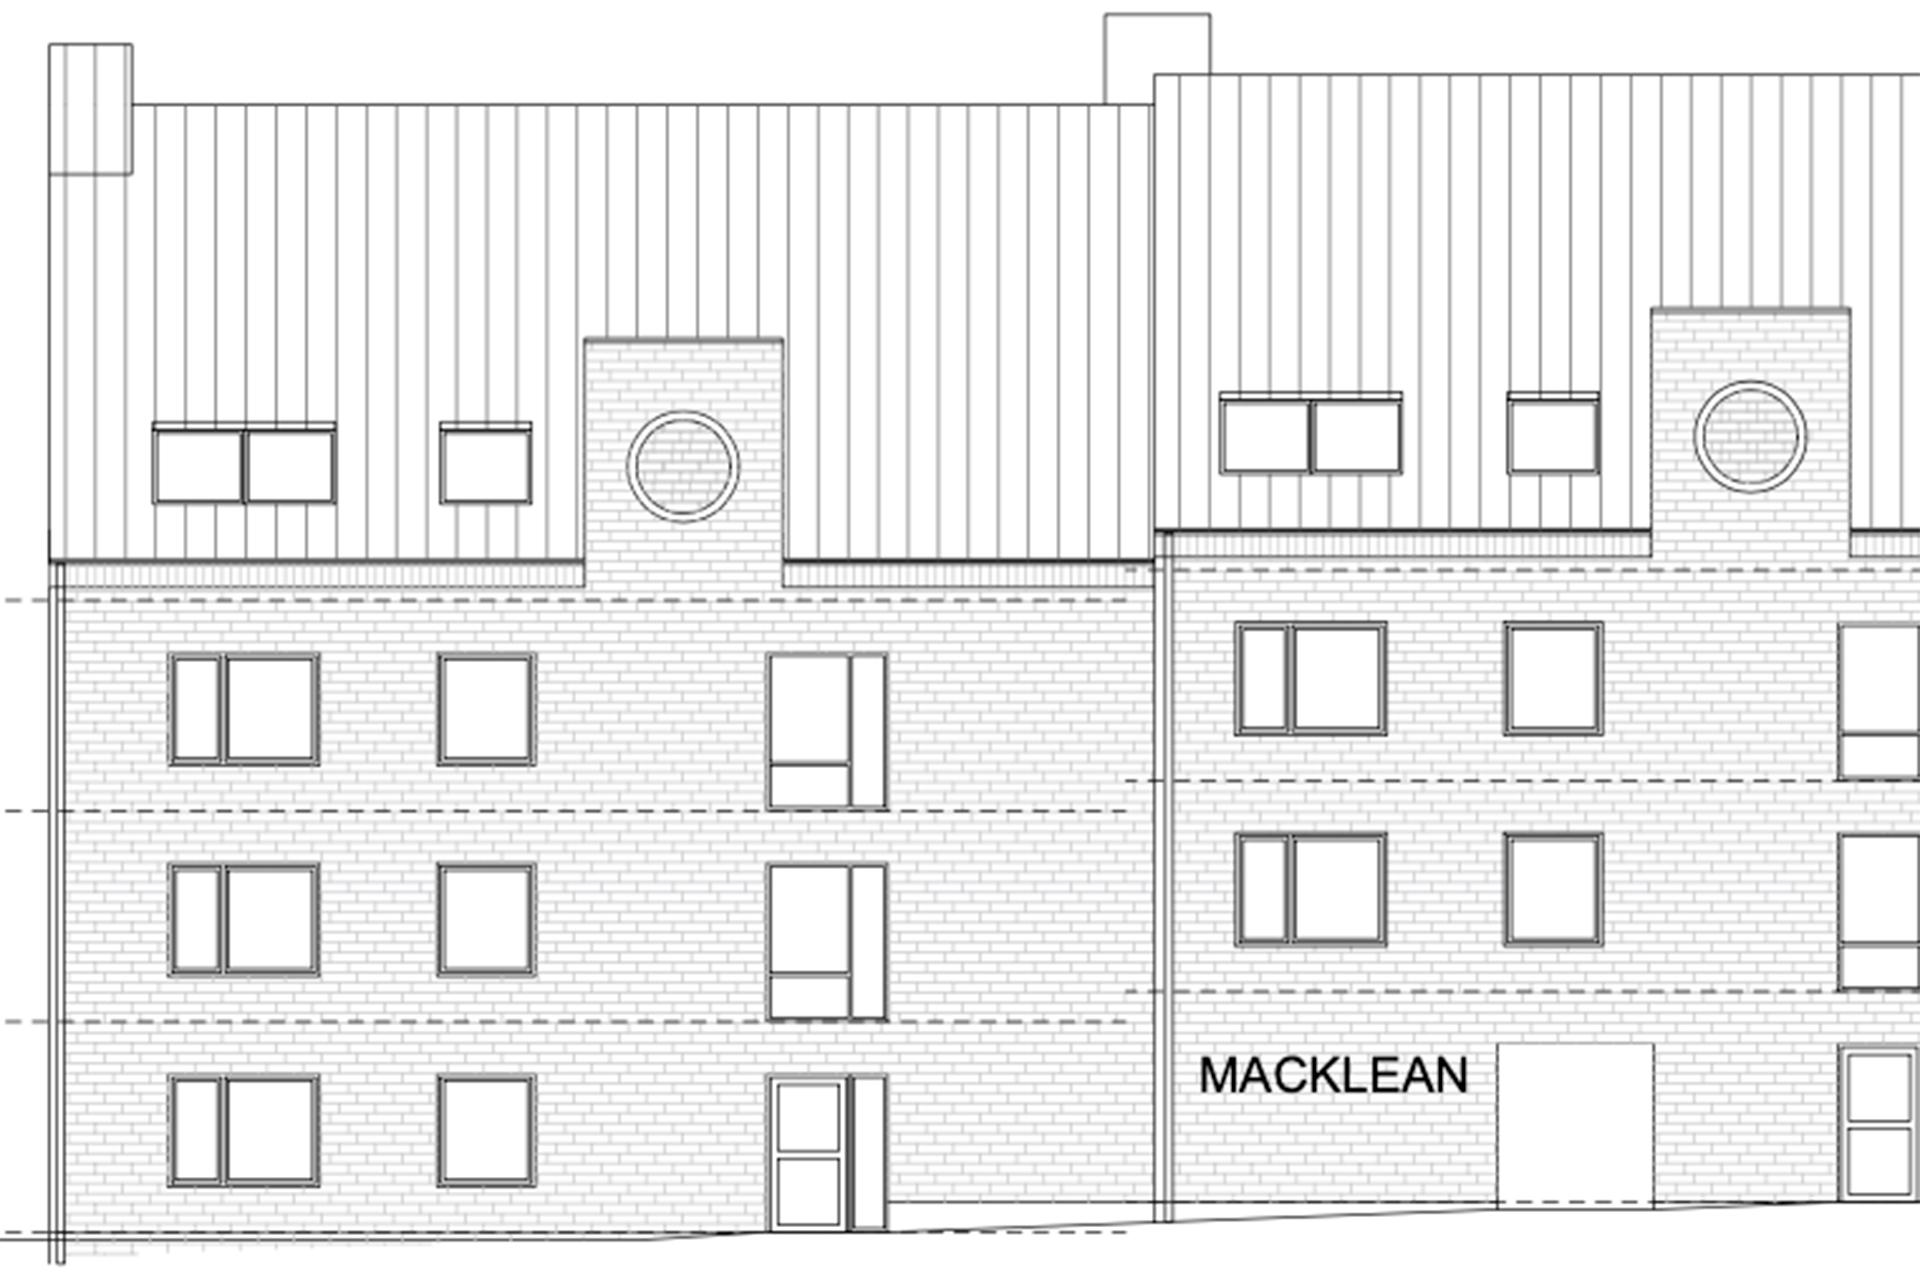 Macklean 4, 5, 6, 13, Skurup